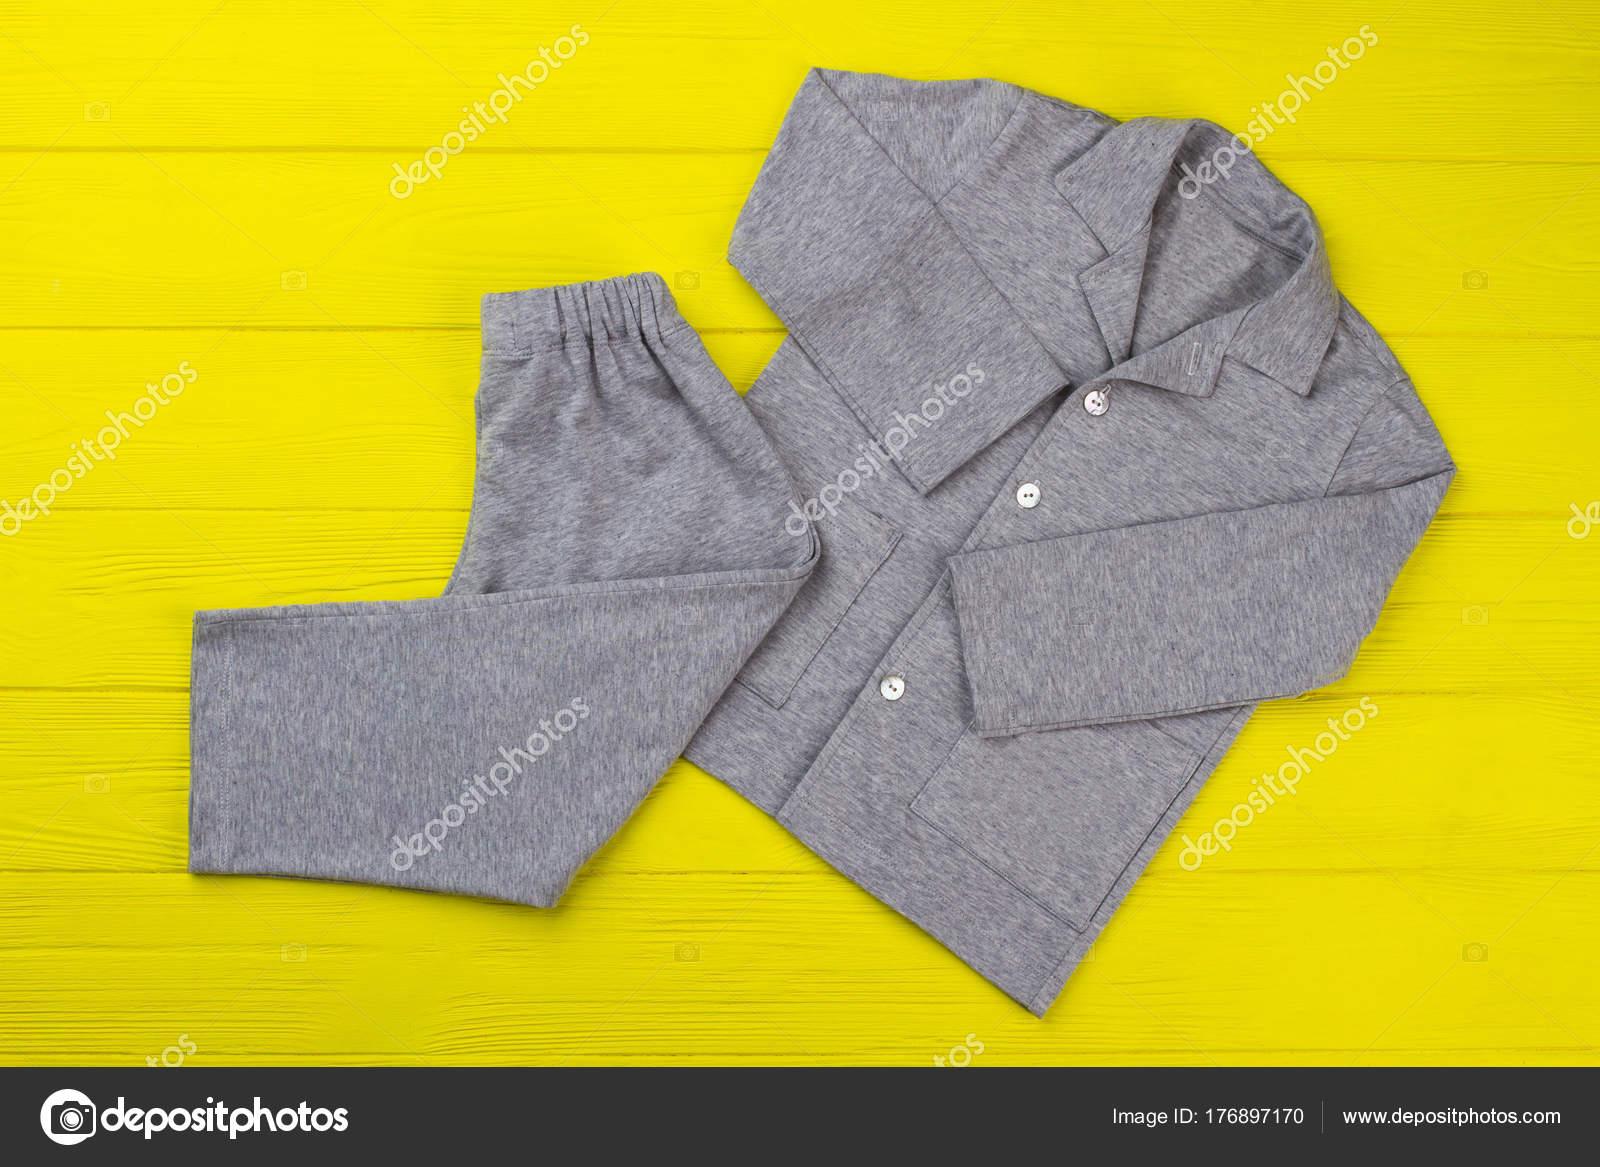 afd245354c2 Αγόρια pajama σε κίτρινο πίνακα. Απλός σχεδιασμός και γκρι μελανζέ ύφασμα.  Άνετο παντελόνι και πουκάμισο για καλό ύπνο — Εικόνα από ...